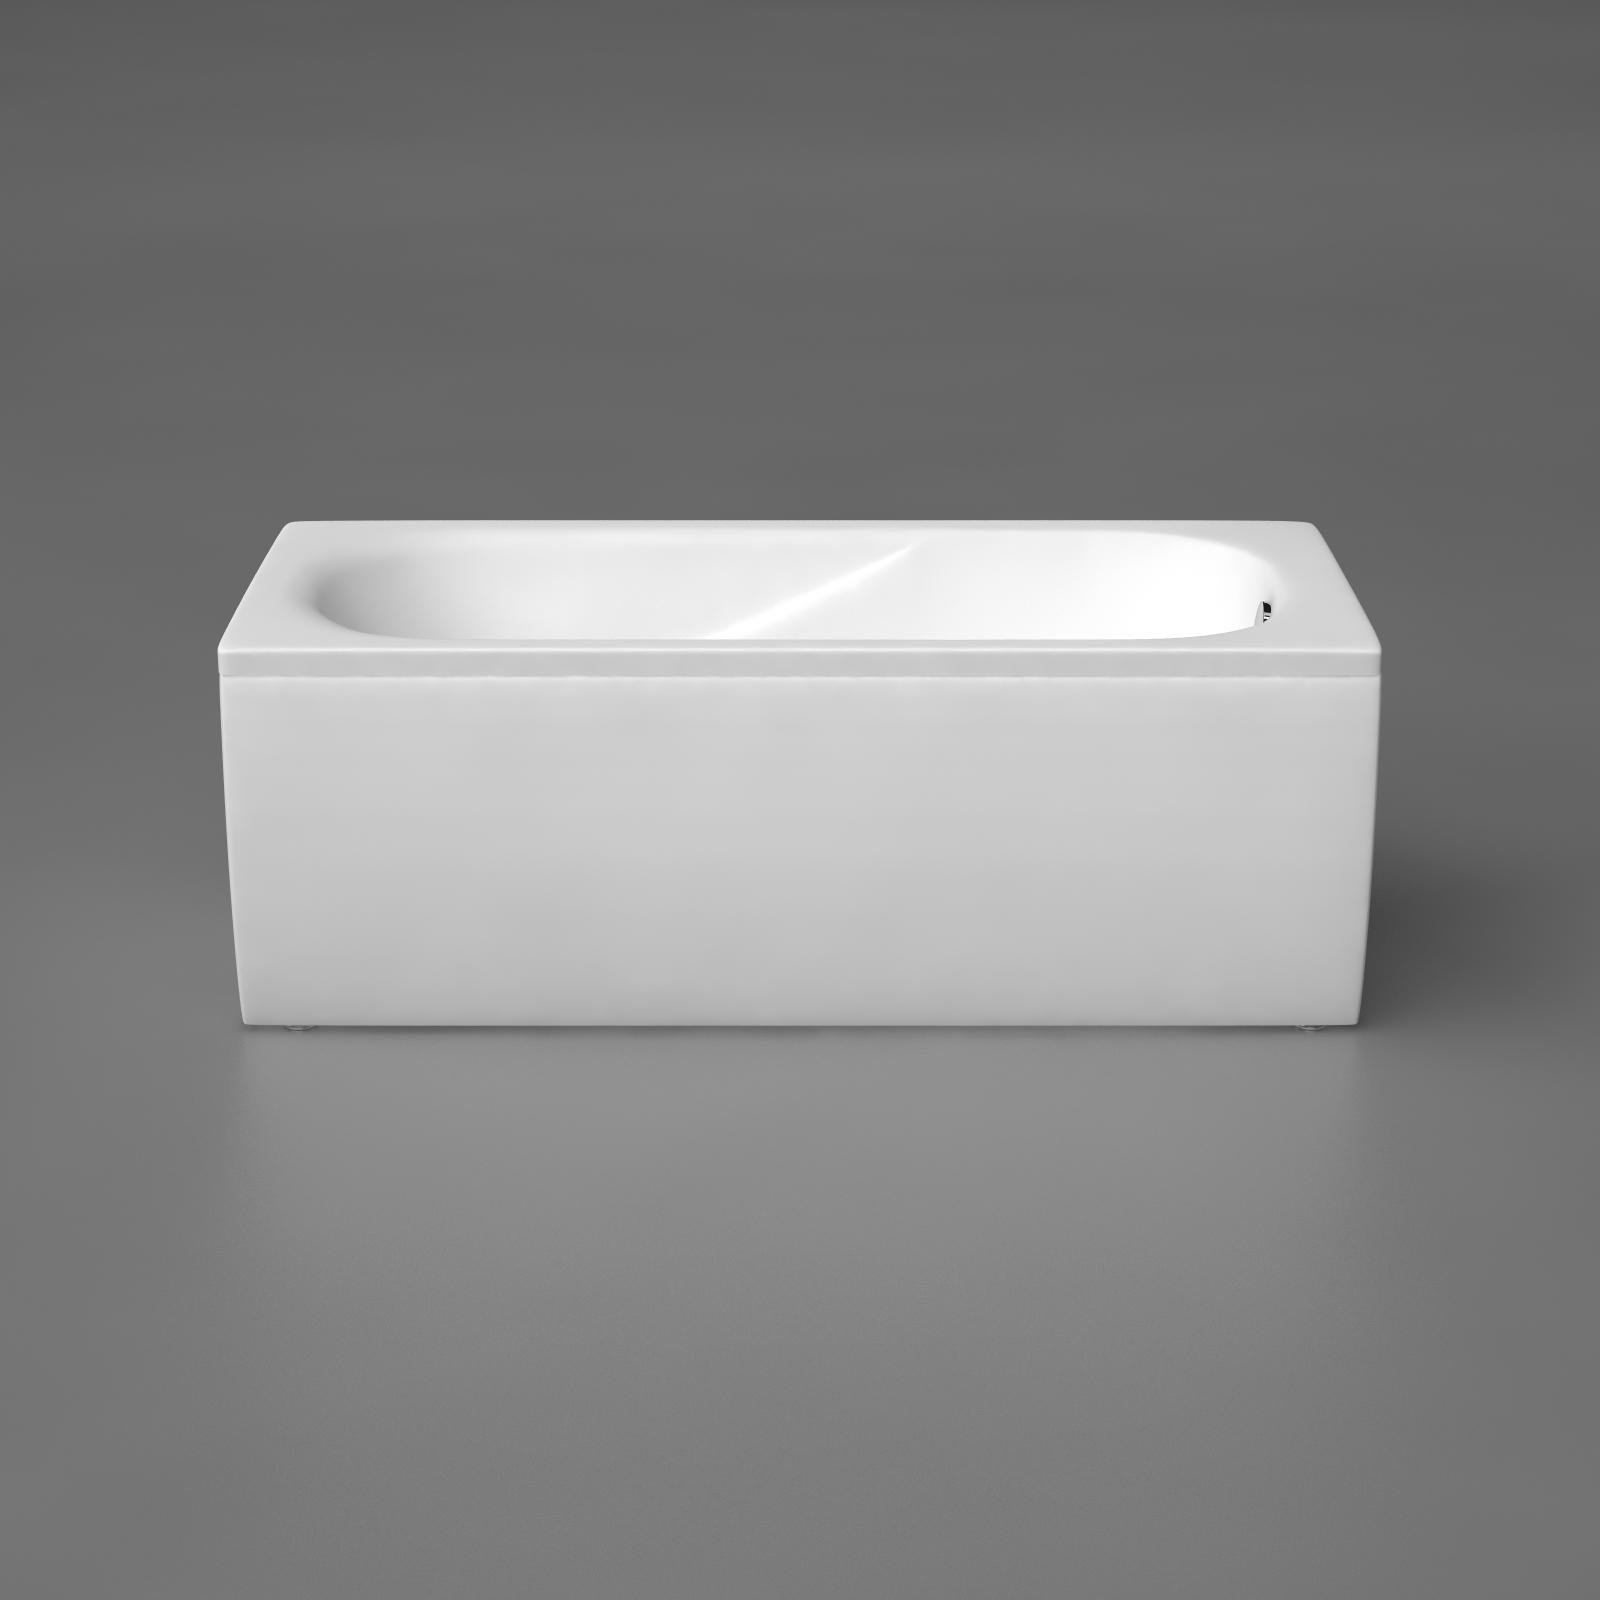 Vannas : Akmens masas vanna Classica 170, Ванна из каменной массы, Stone cast bathtub